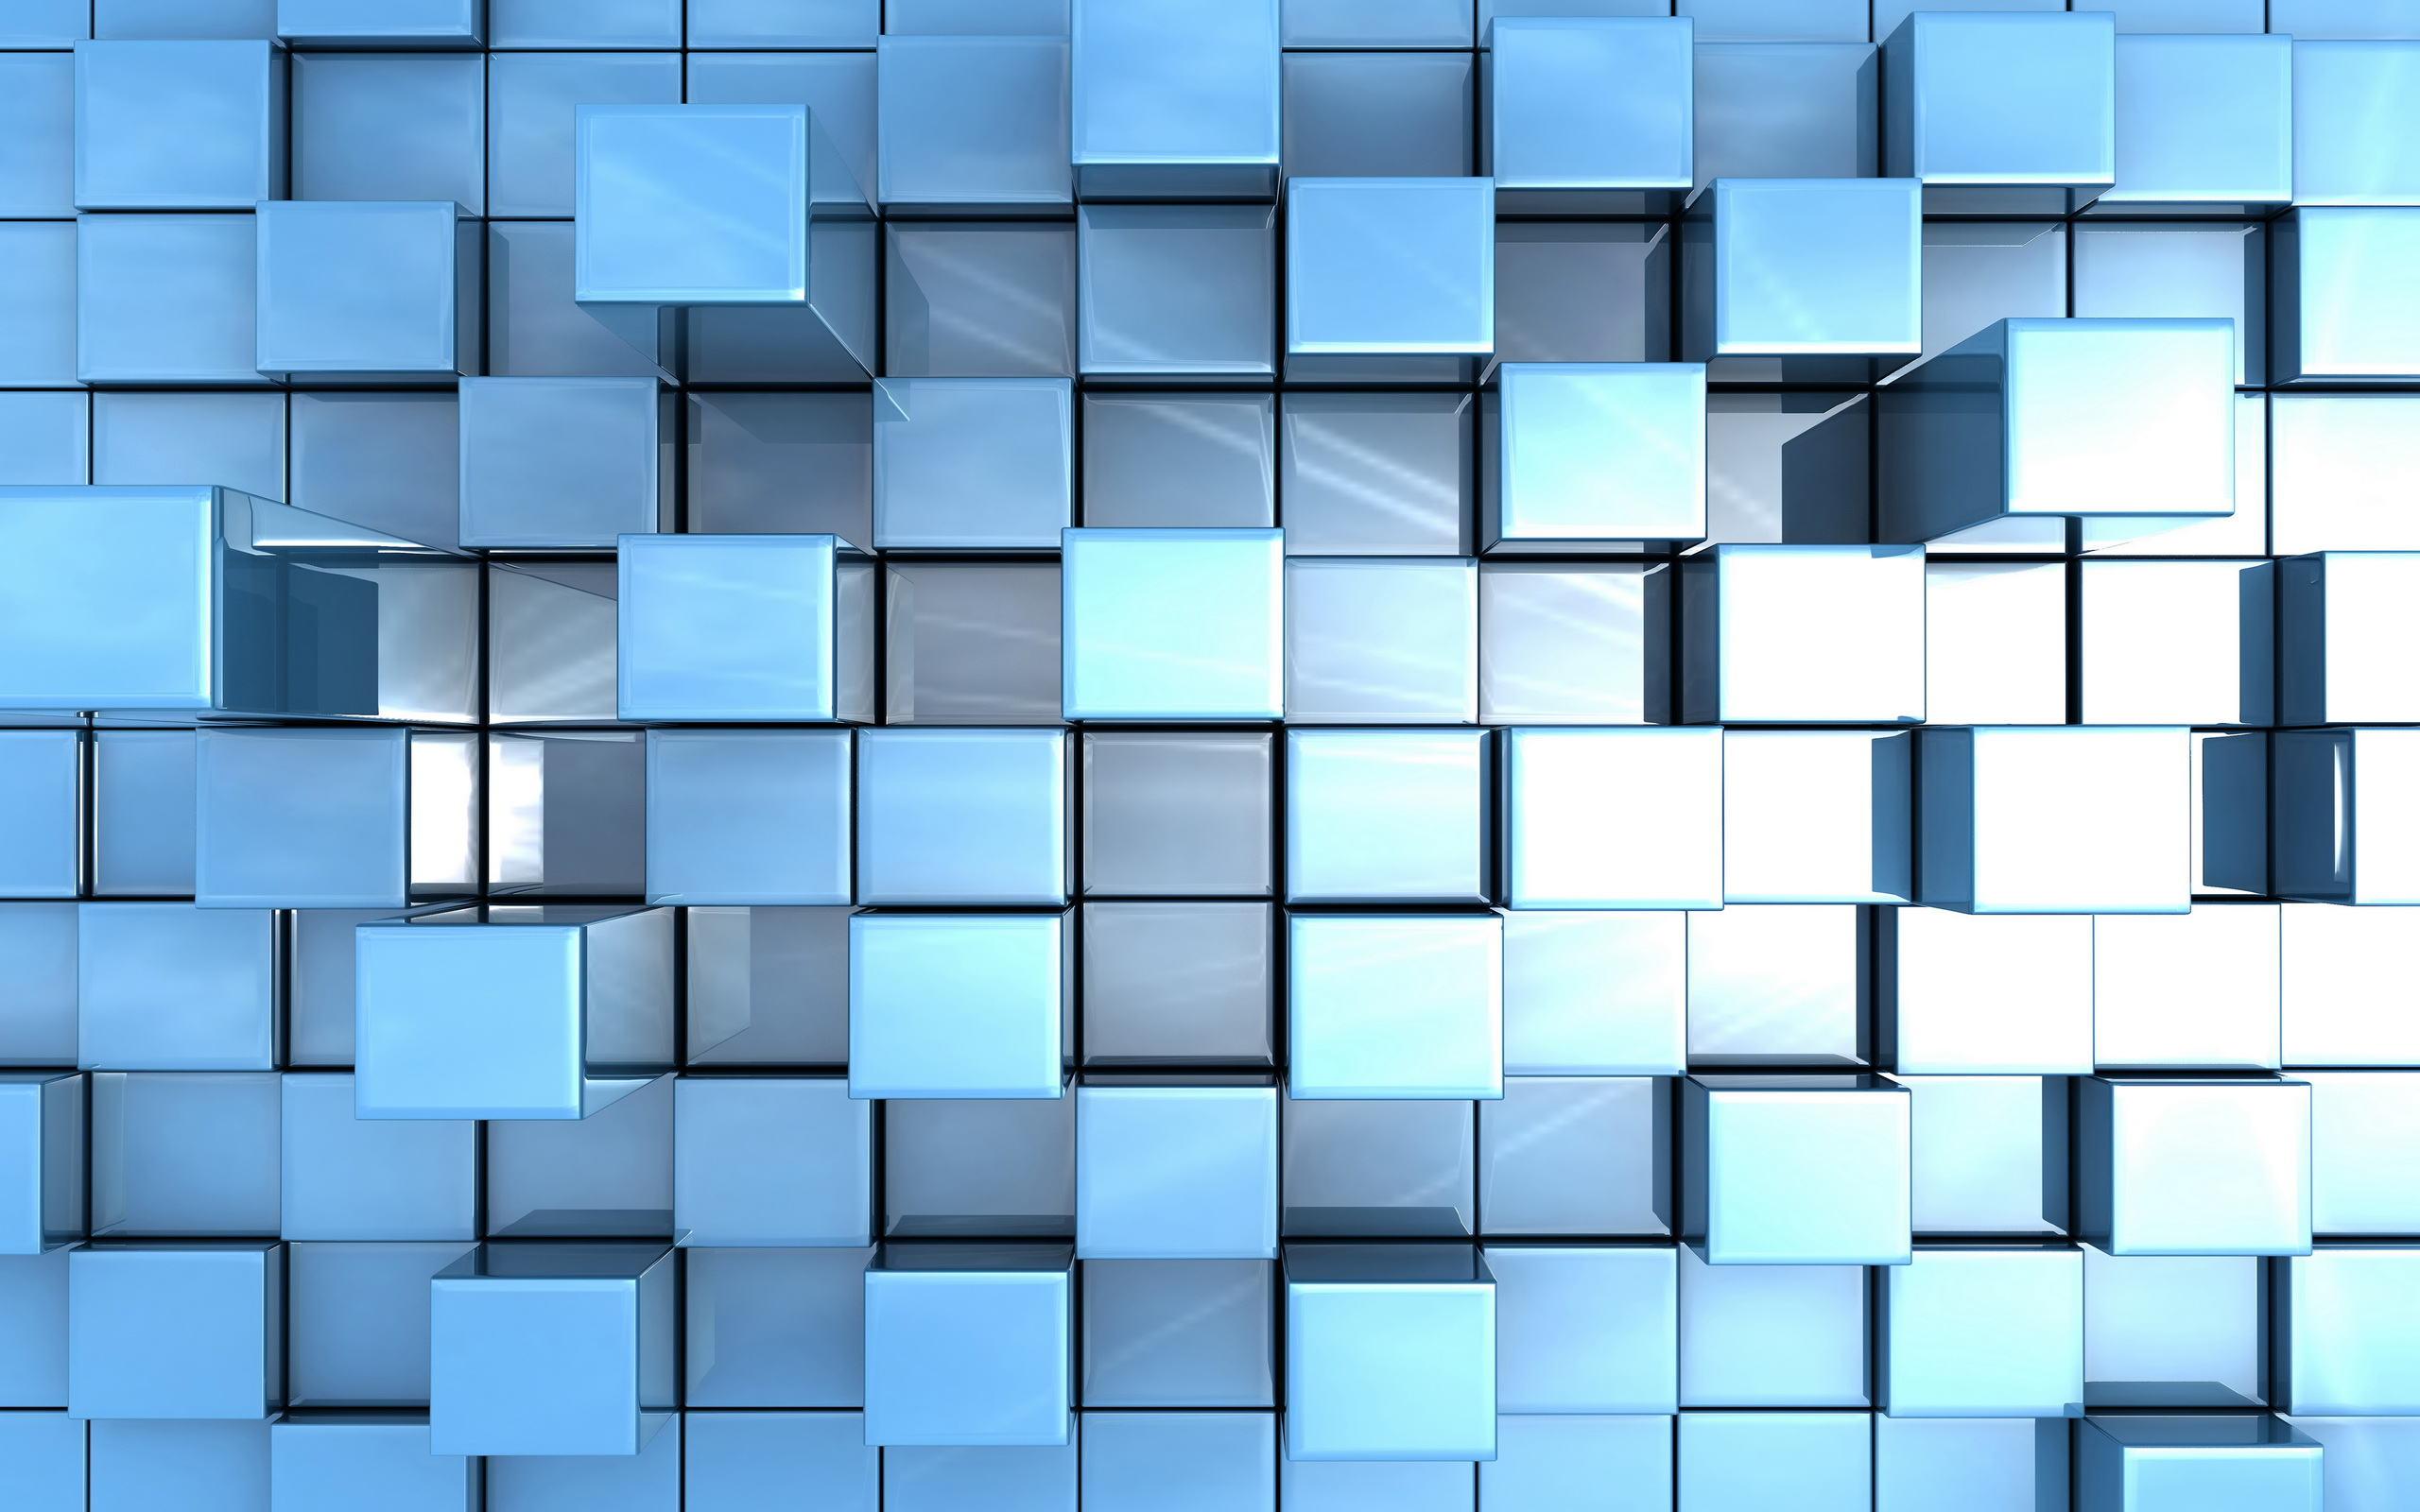 cube computer wallpapers desktop - photo #8